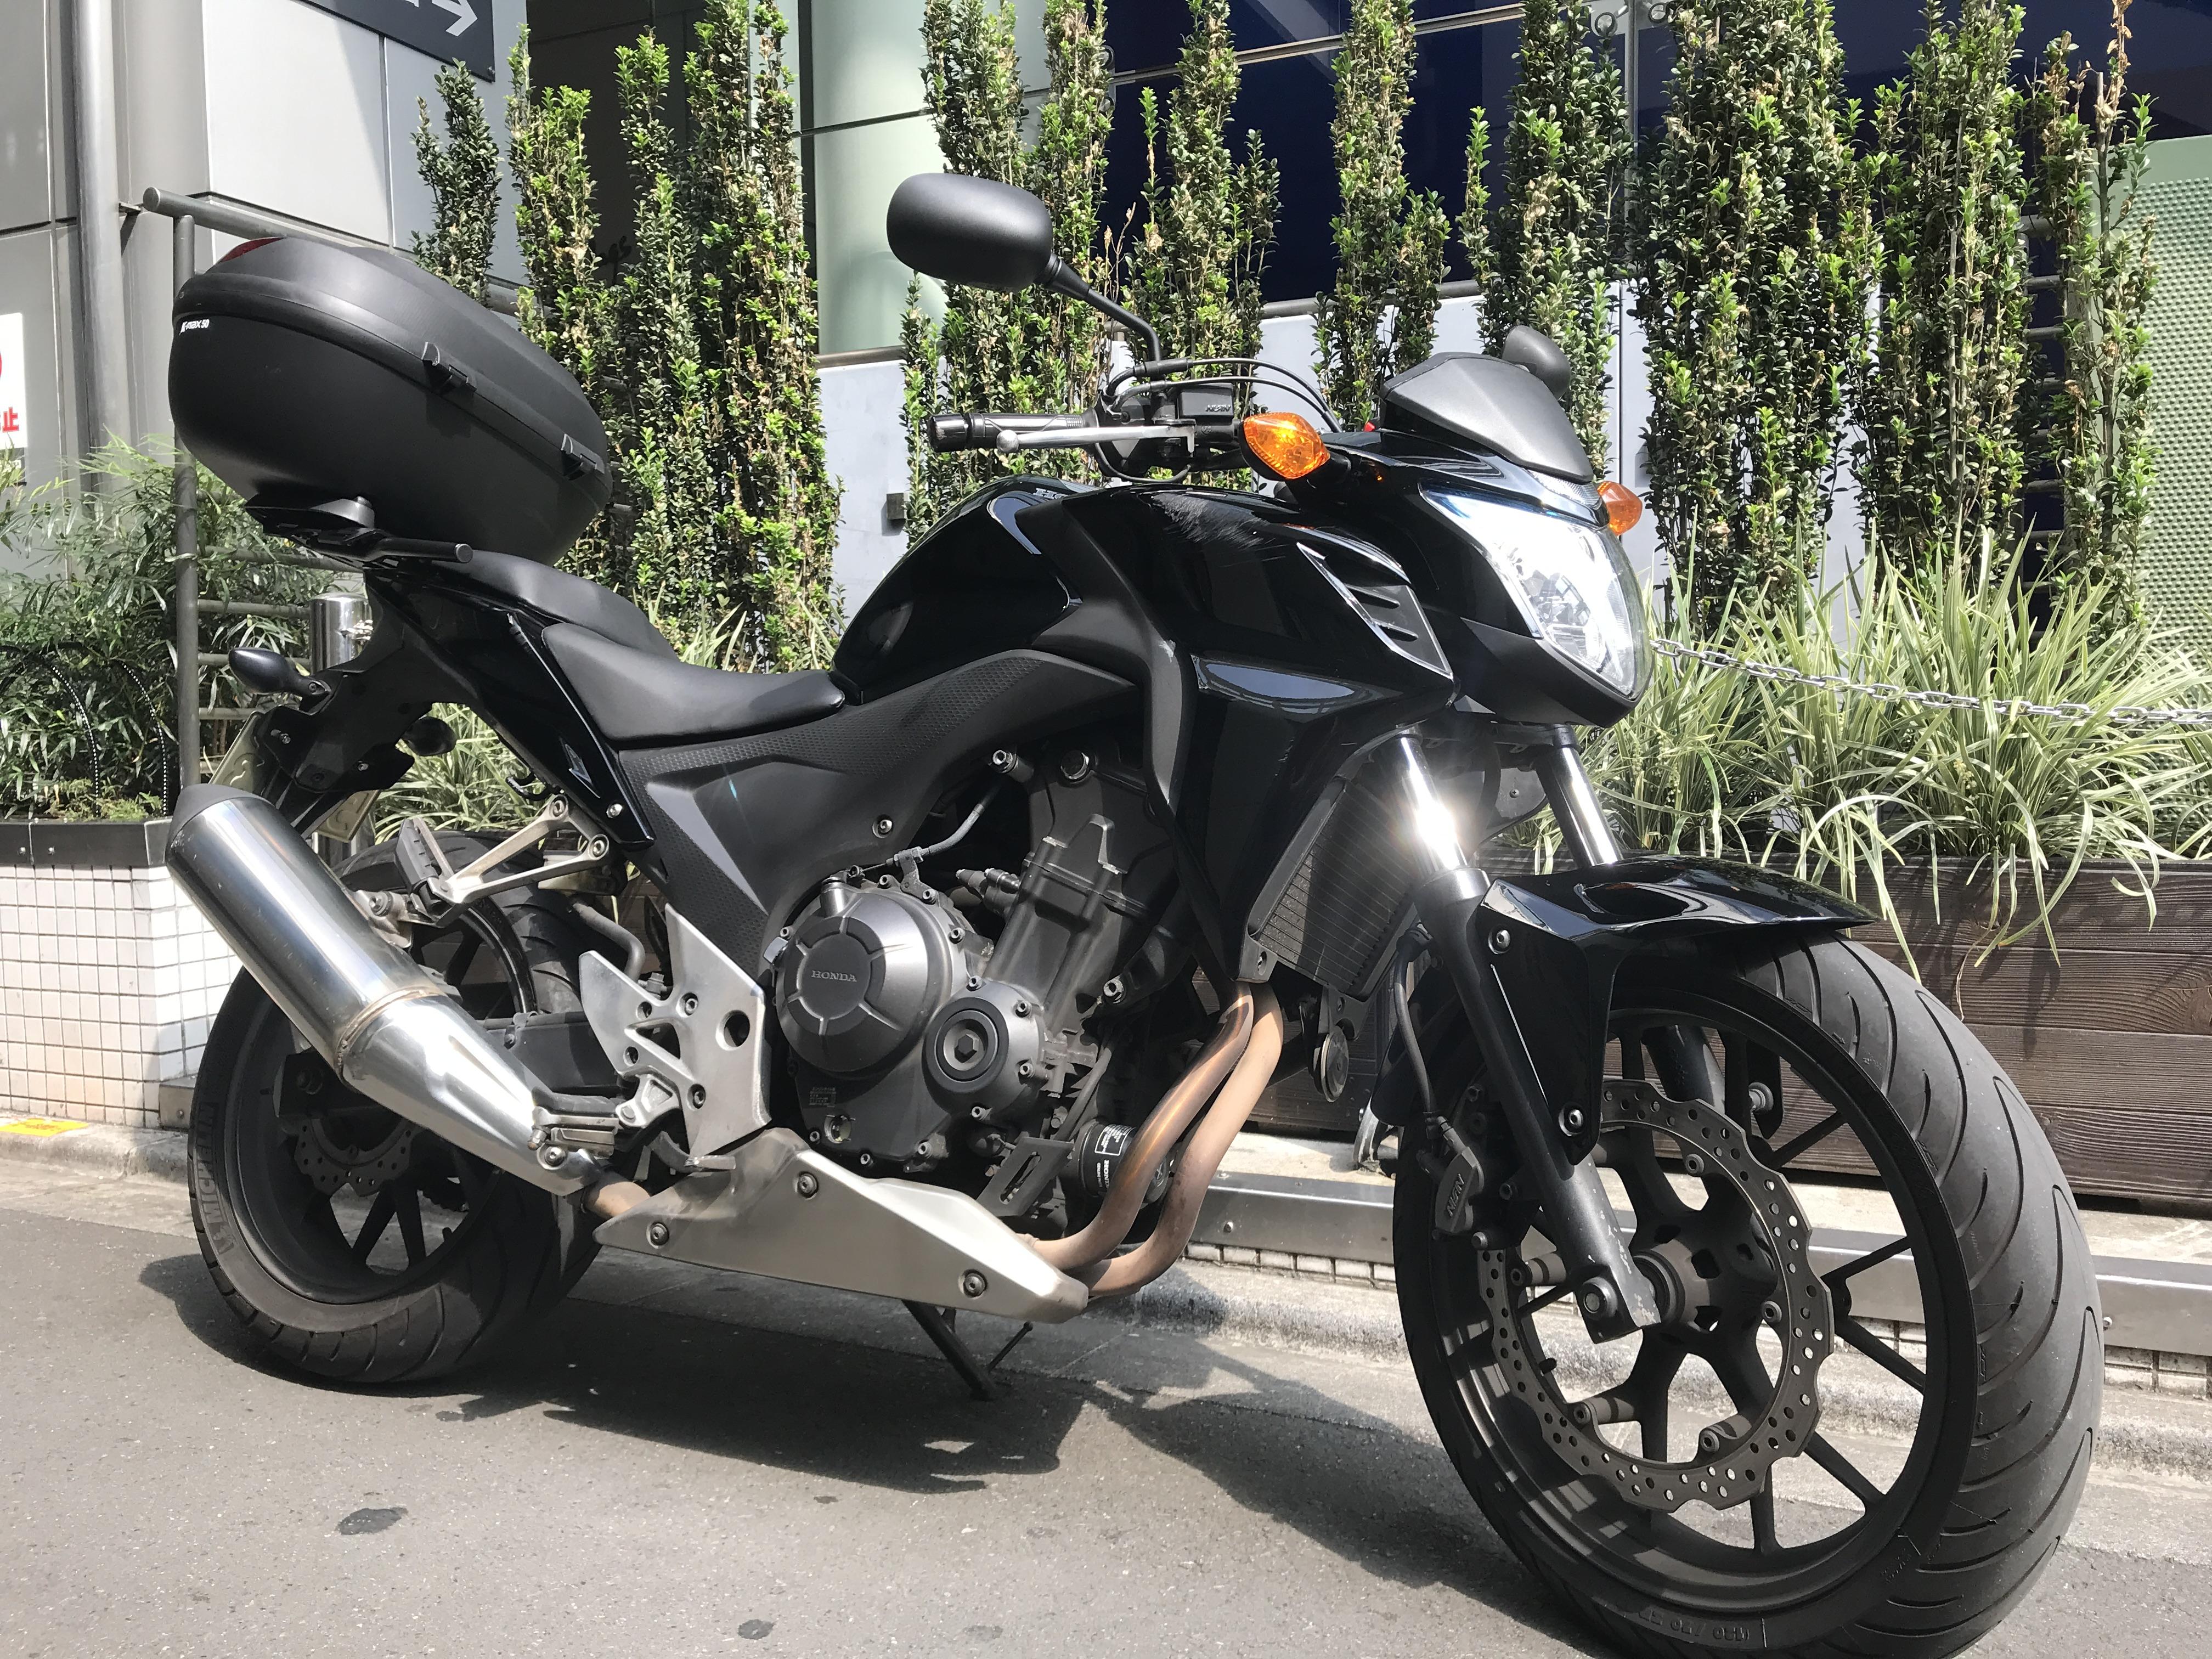 CB400F (SH-006) - 【公式】レンタルバイクのベストBike® 流山おおたかの森駅前